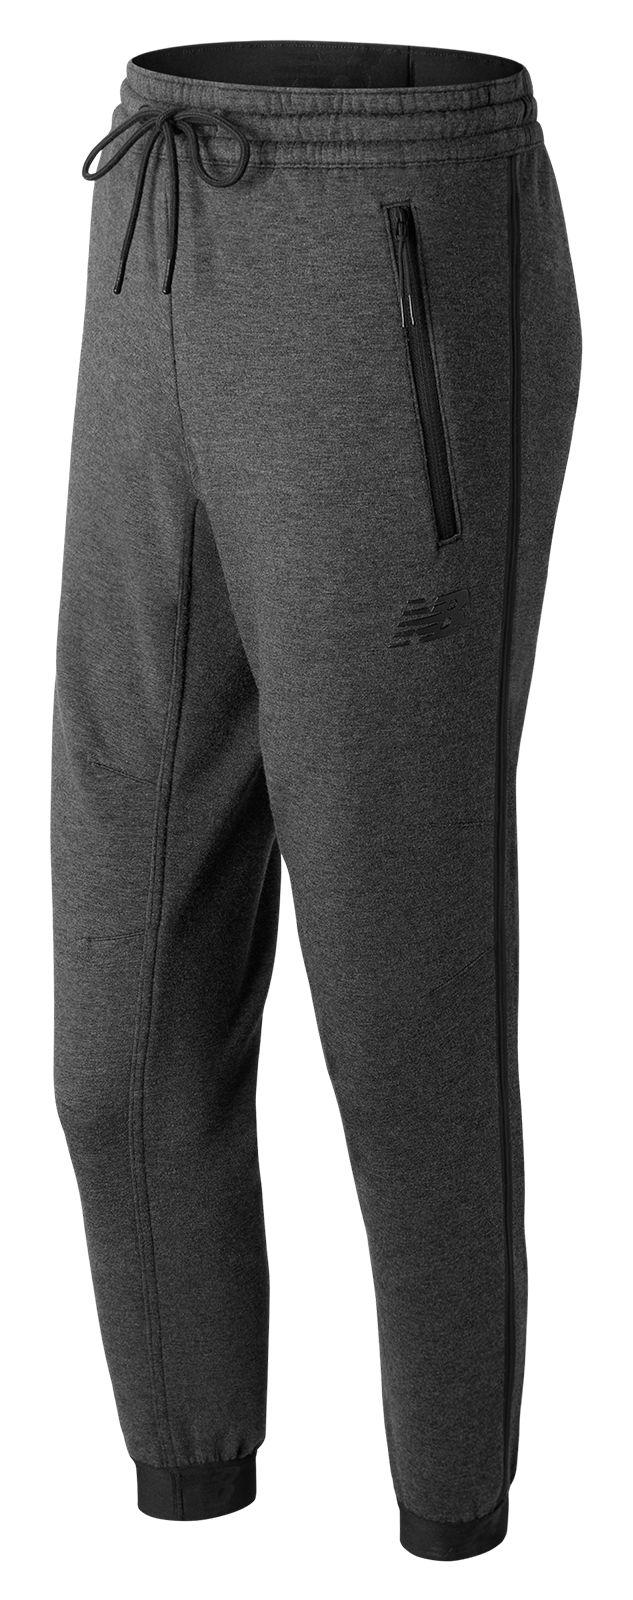 New Balance : Sport Style Pant : Women's Casual : WP63514BKH